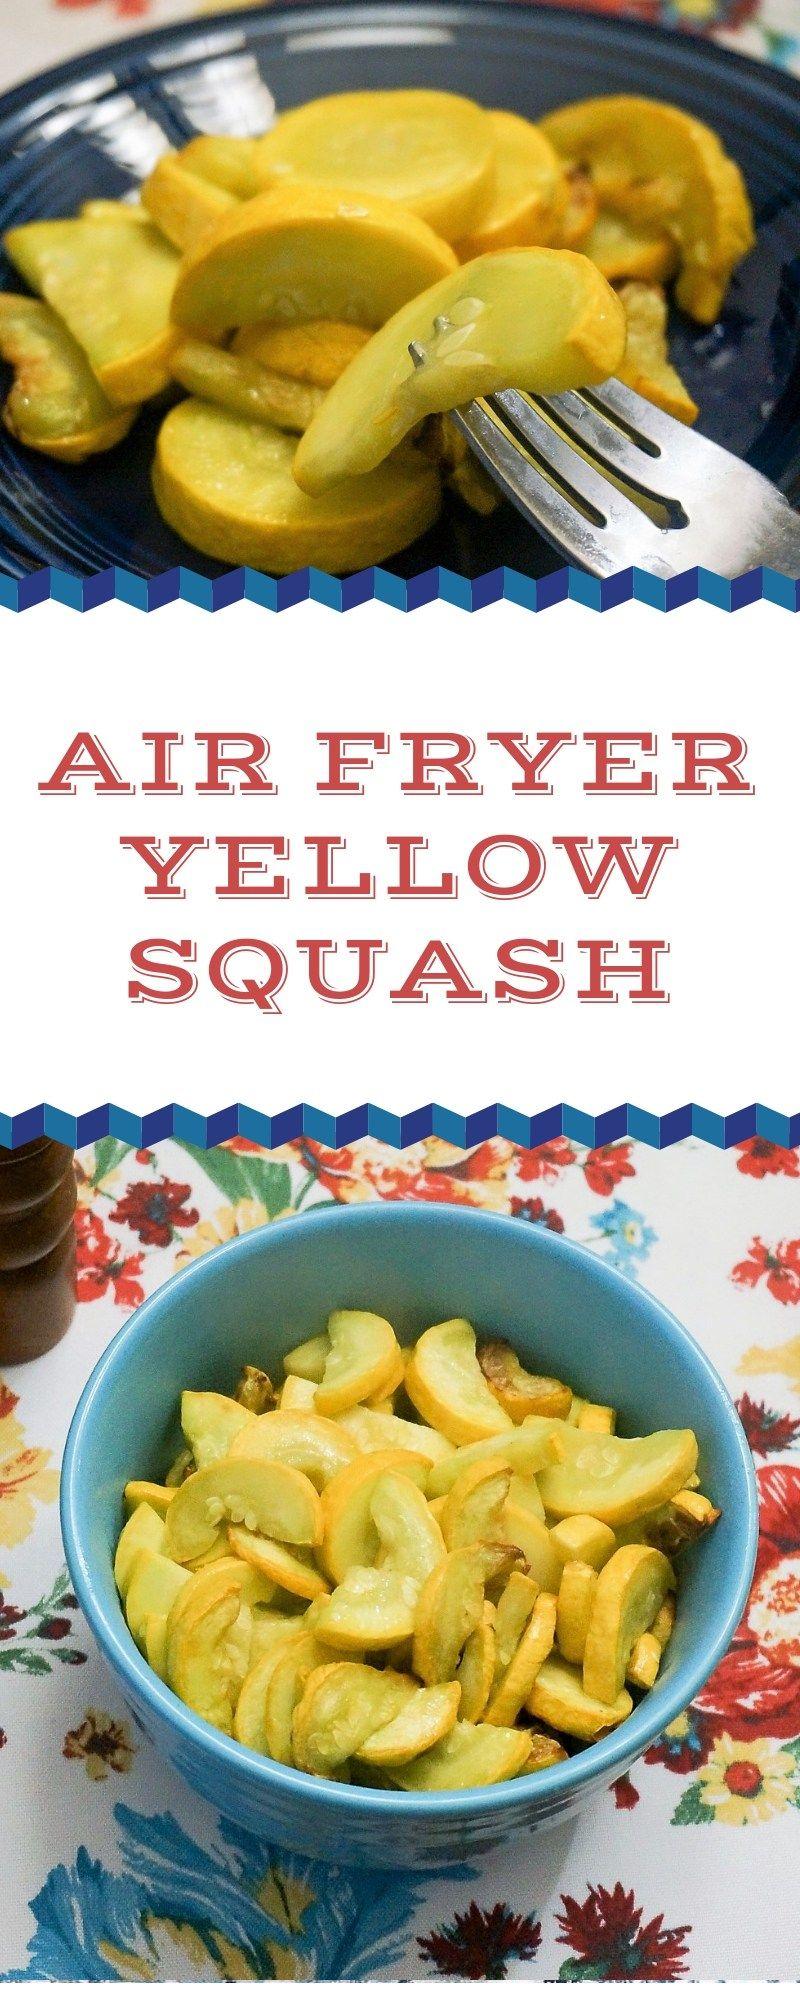 Air Fryer Yellow Squash Recipe Air fryer recipes